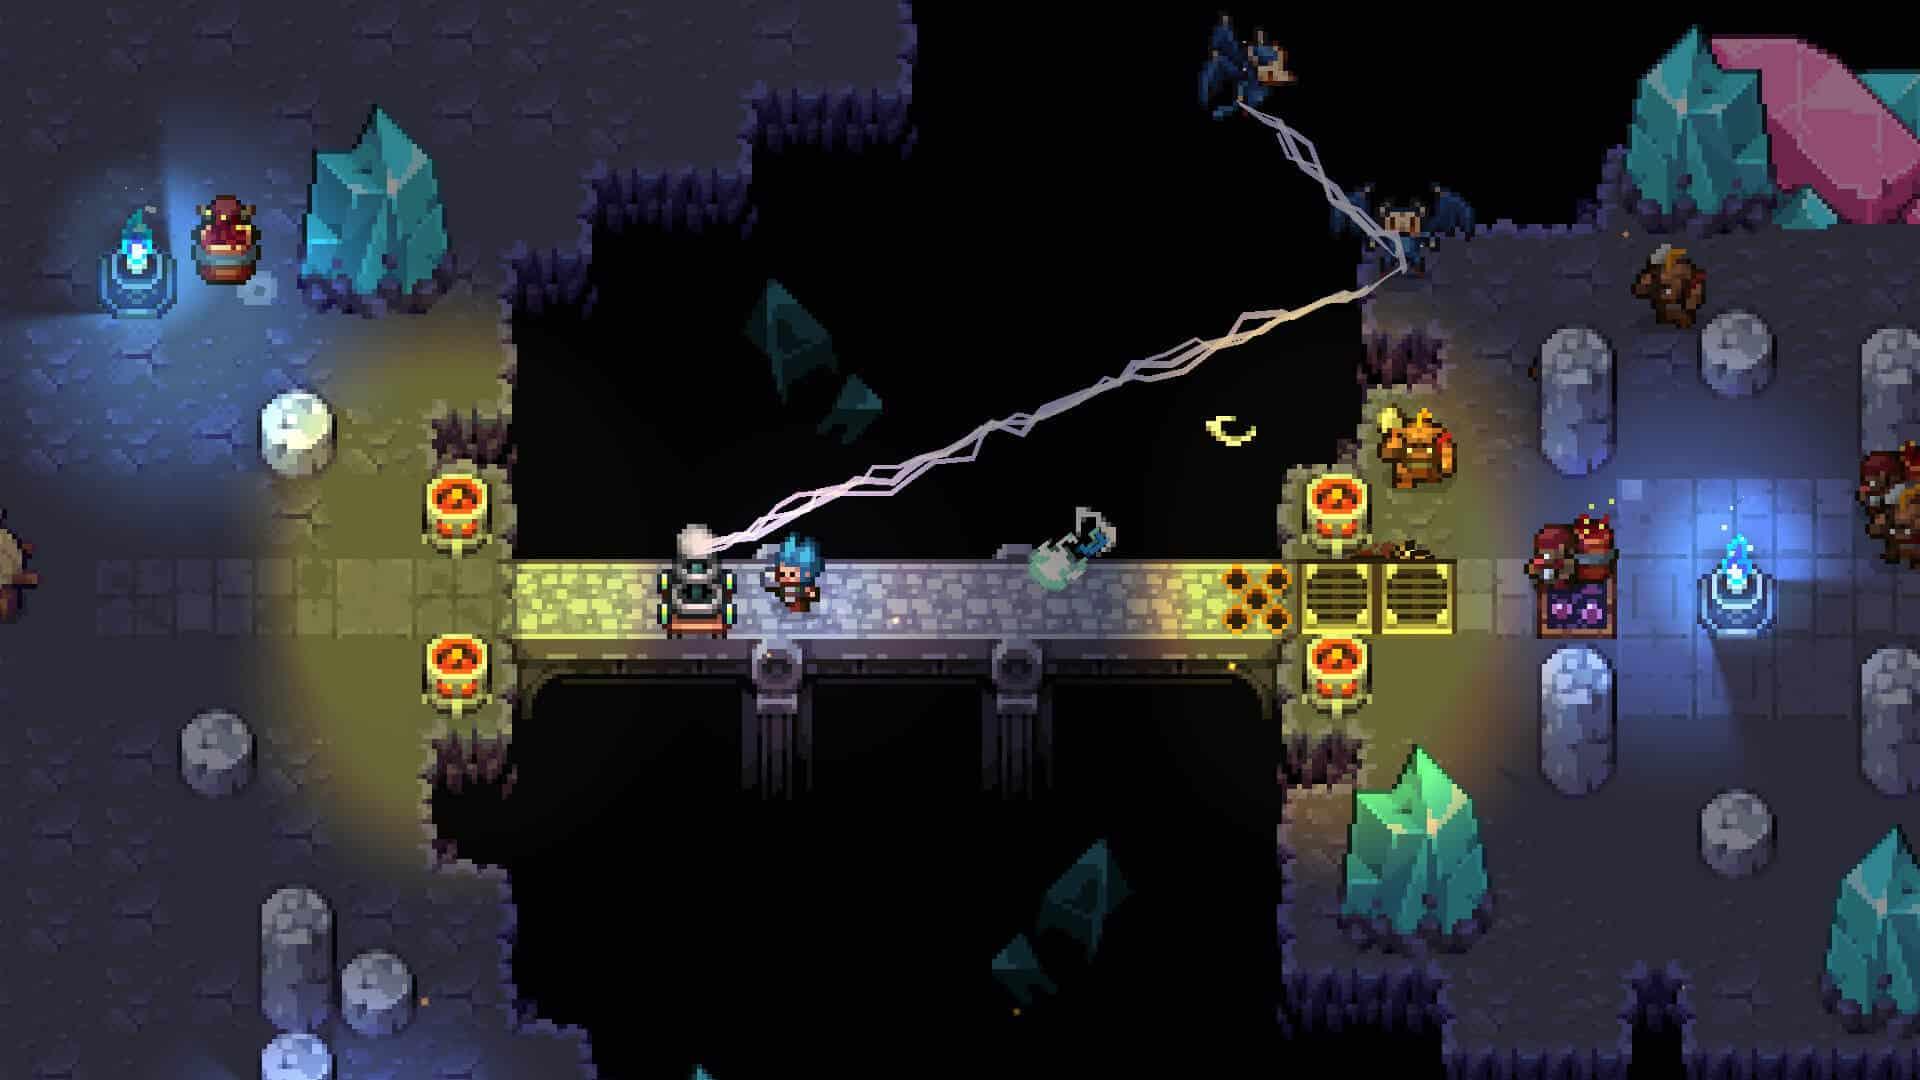 dwerve new tower defense rpg game screenshot 2